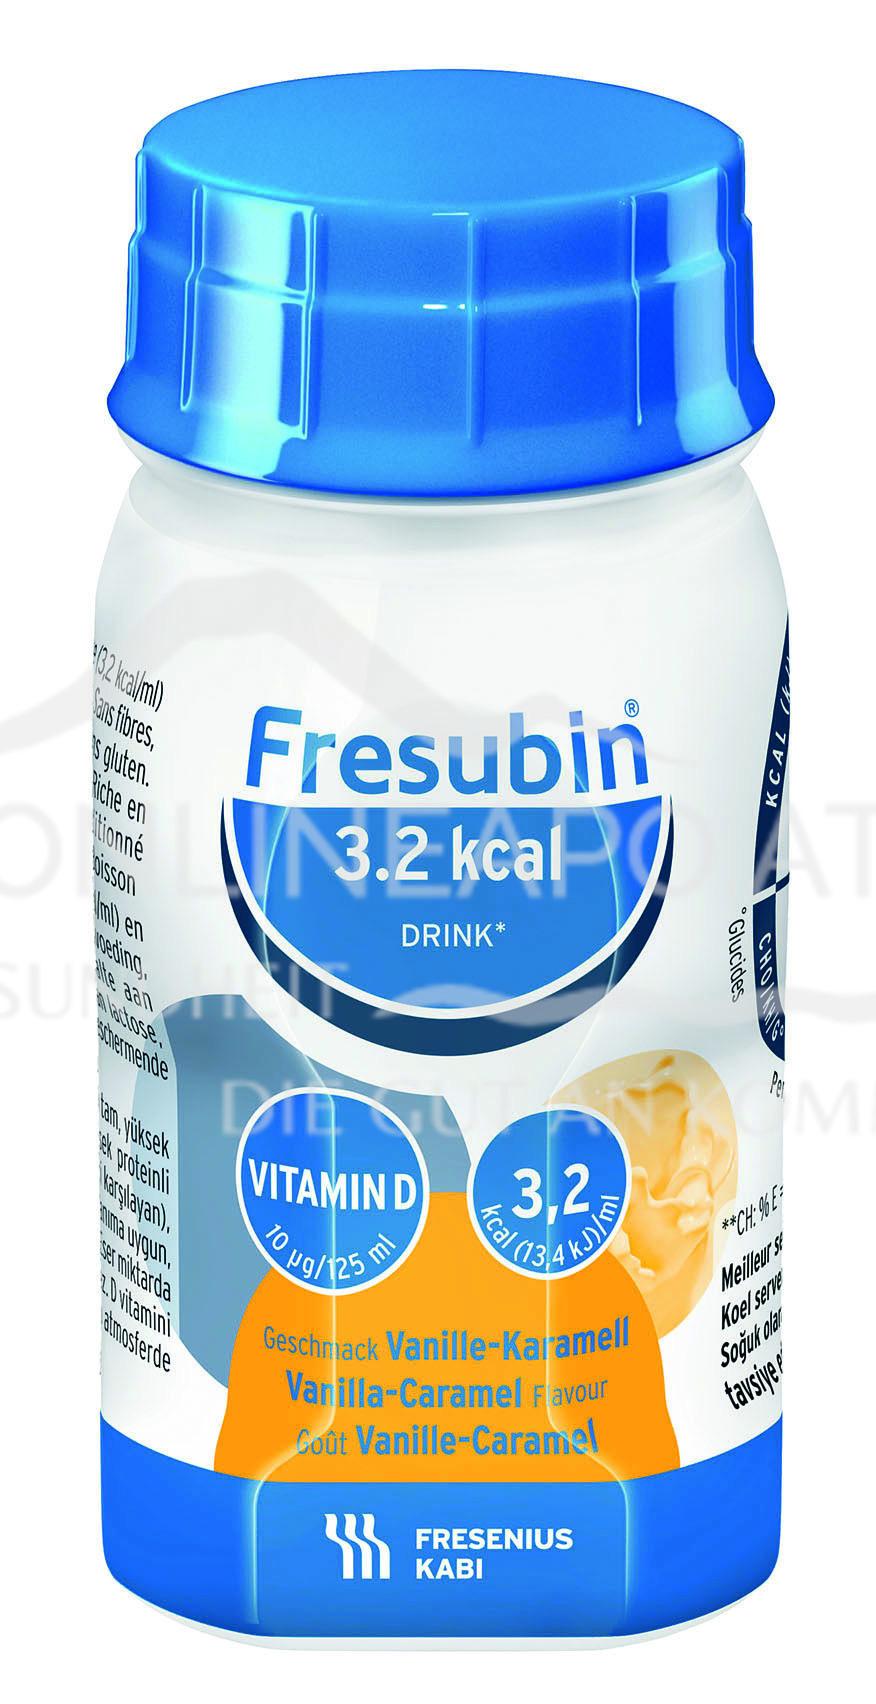 Fresubin® 3.2 kcal DRINK Vanille-Karamell